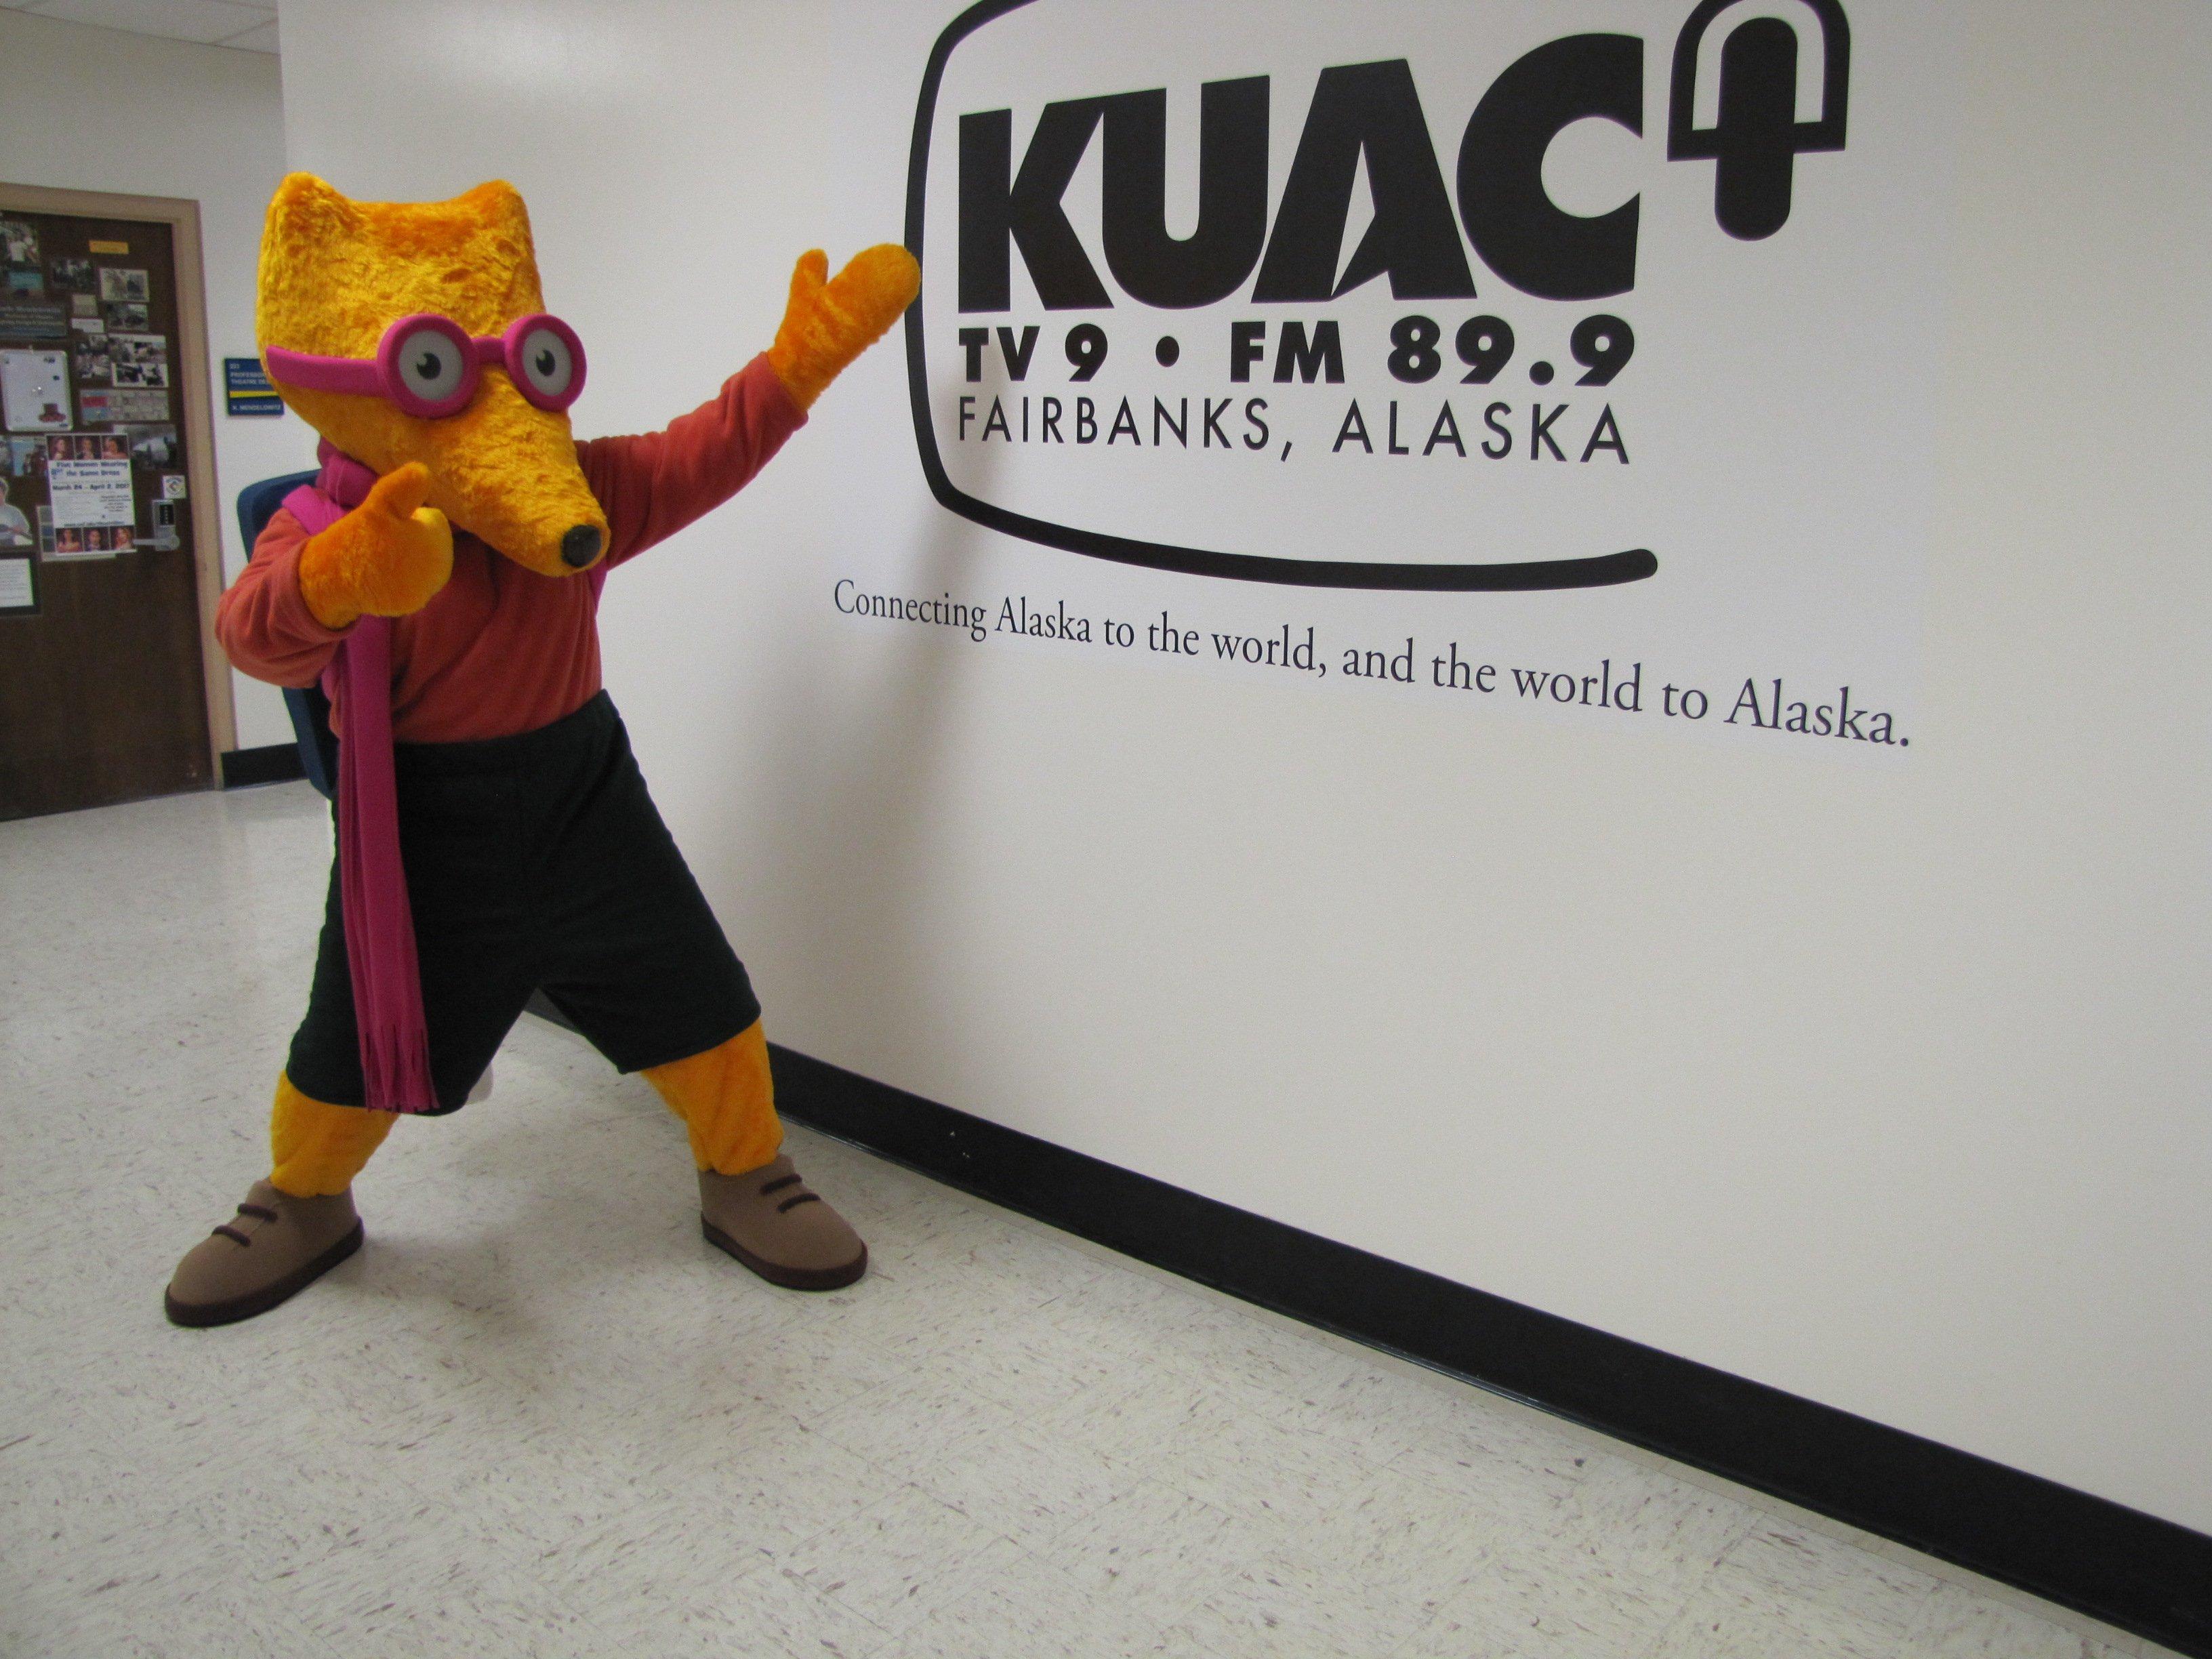 KUAC Kitt the Fox mascot